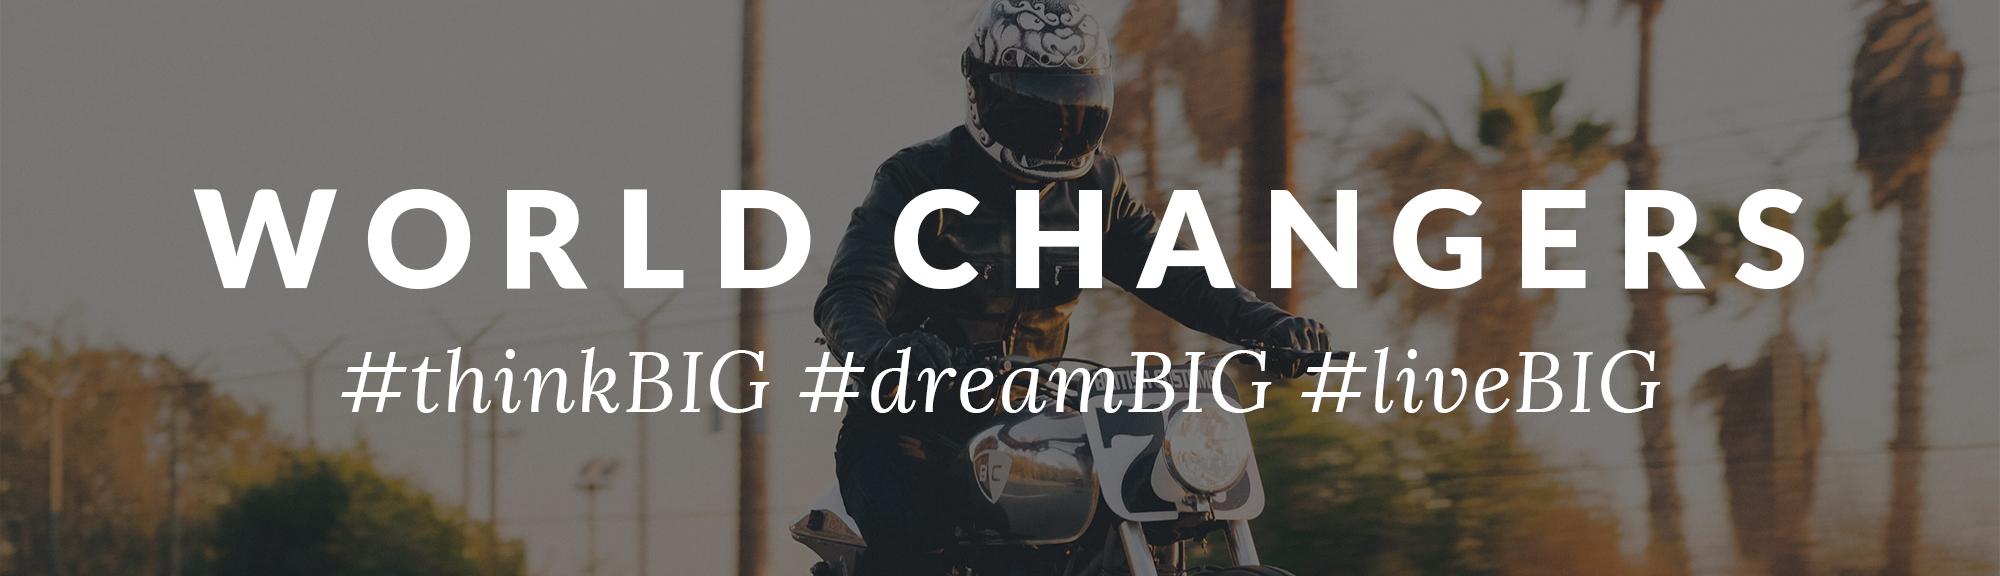 #thinkBIG #dreamBIG #liveBIG Campaign | Japheth Mast Blogger